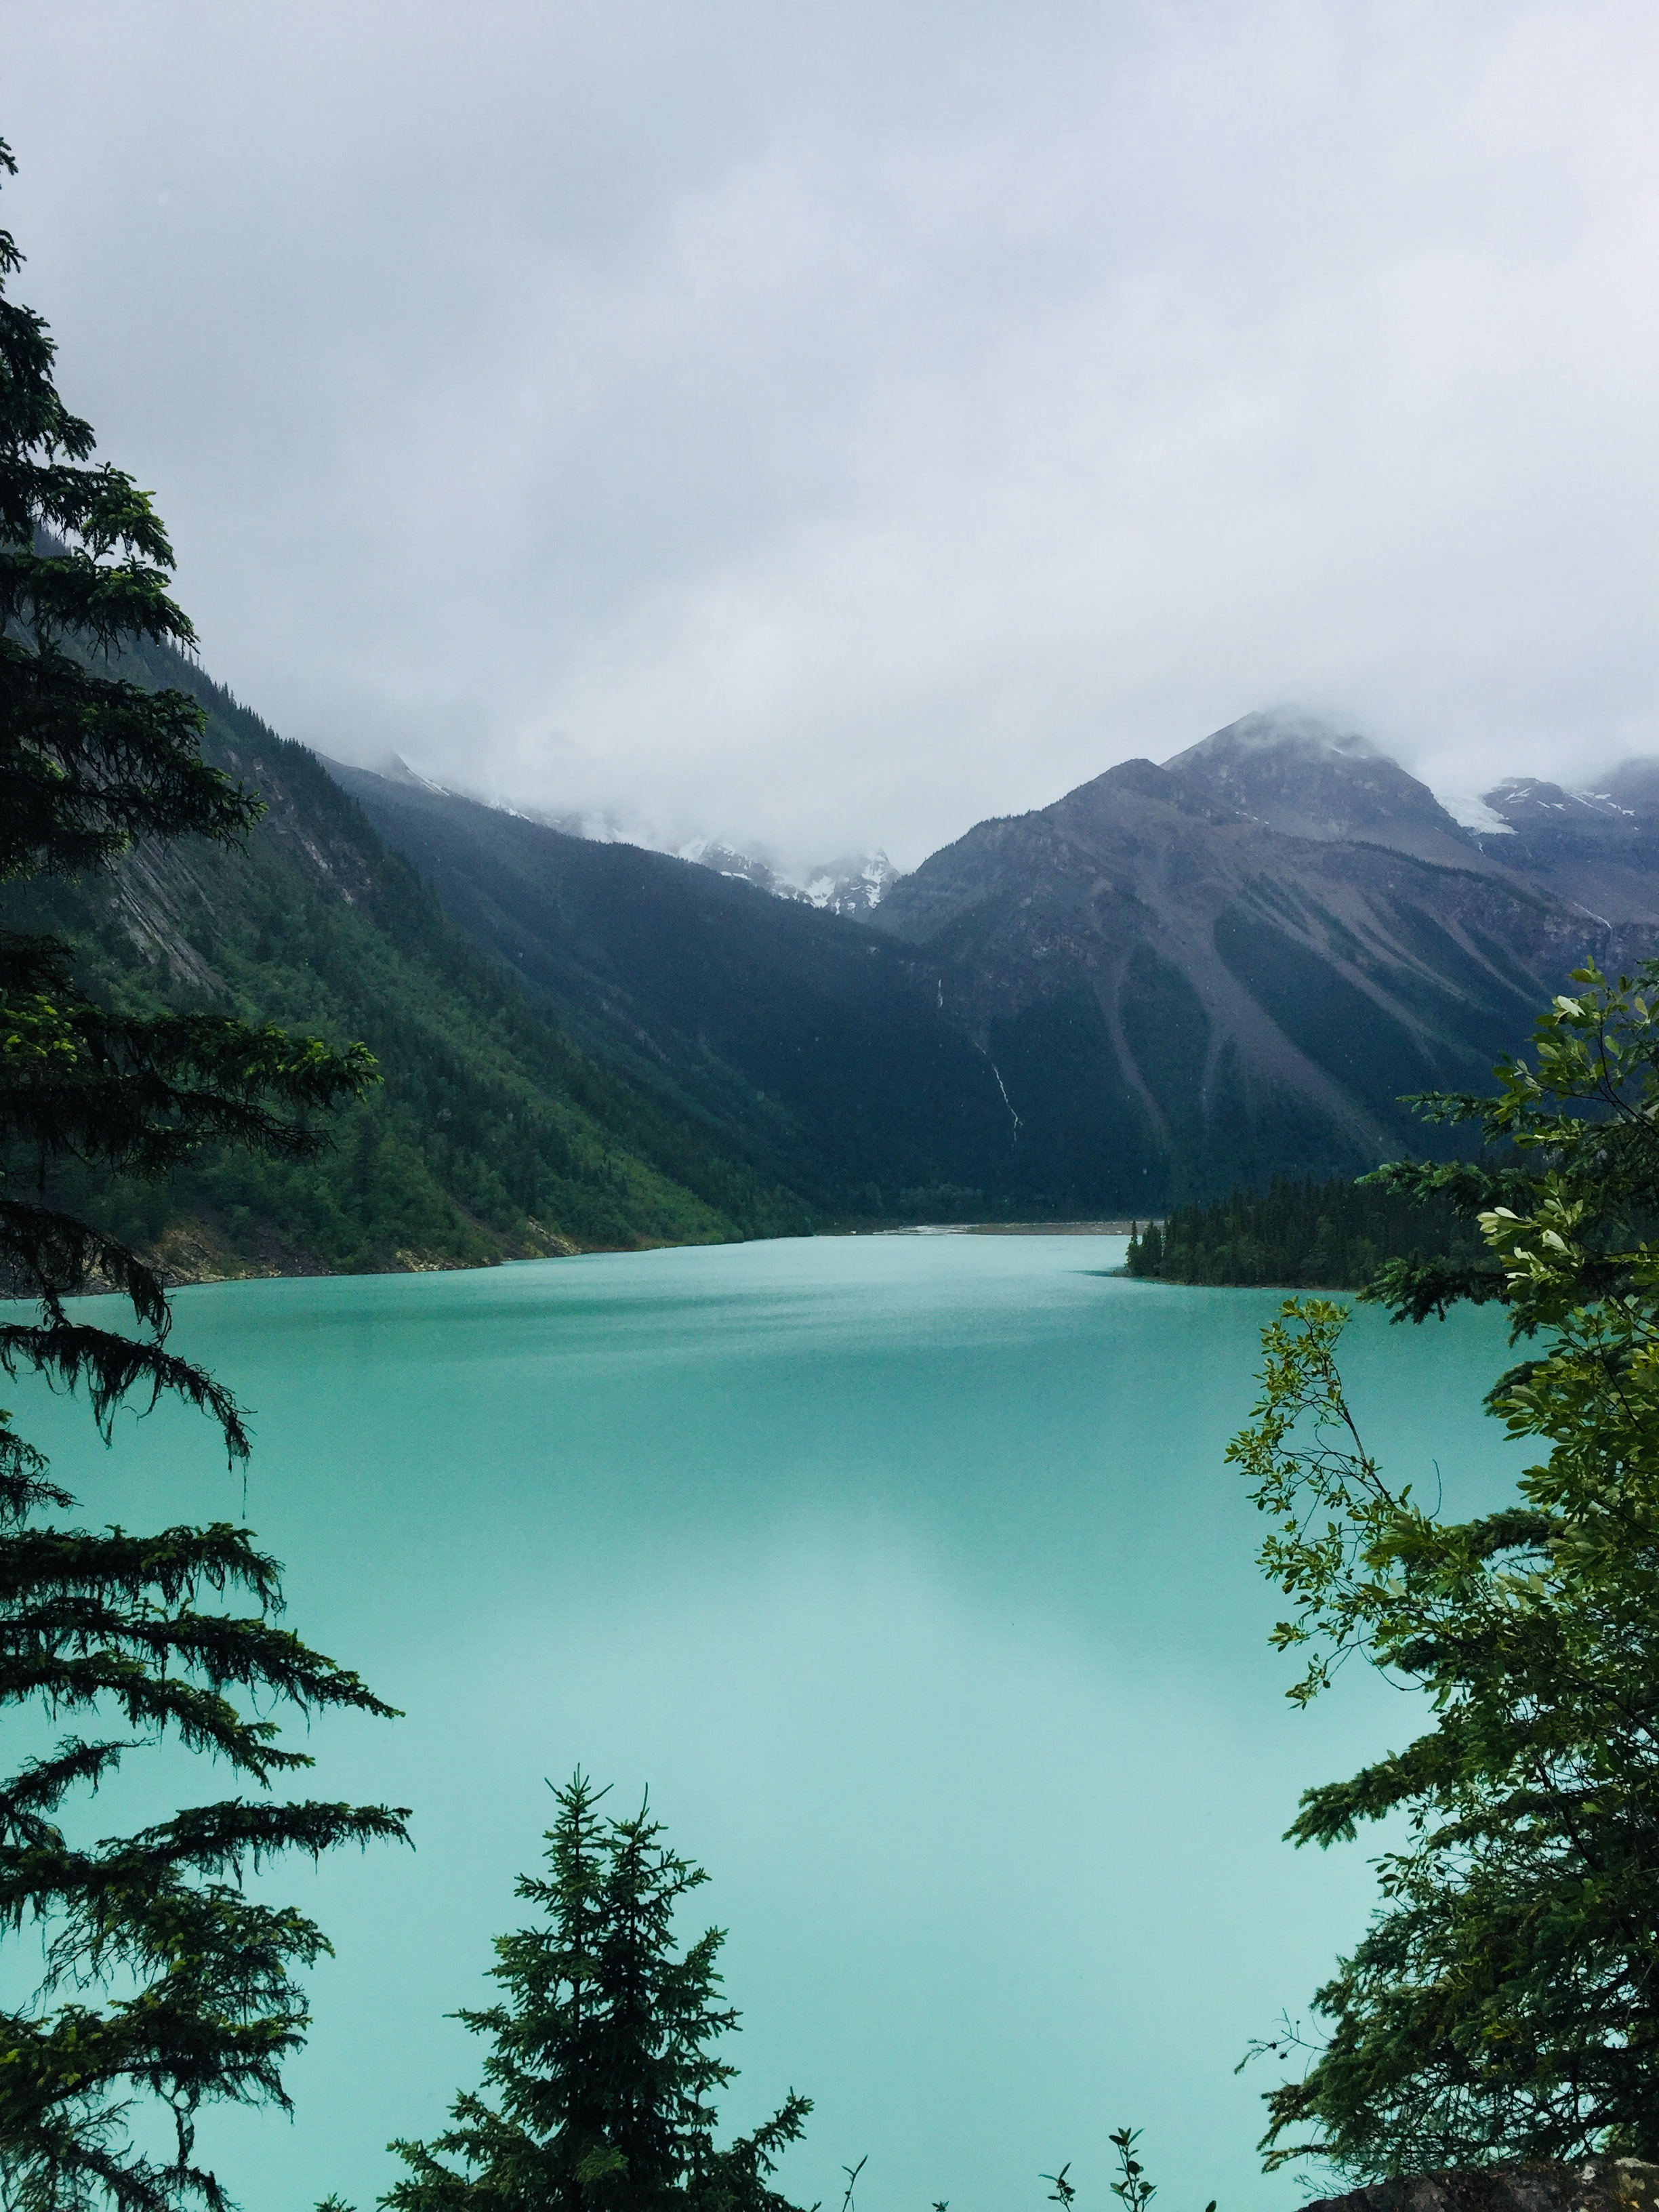 Kinney Lake in Mt. Robson Provincial Park